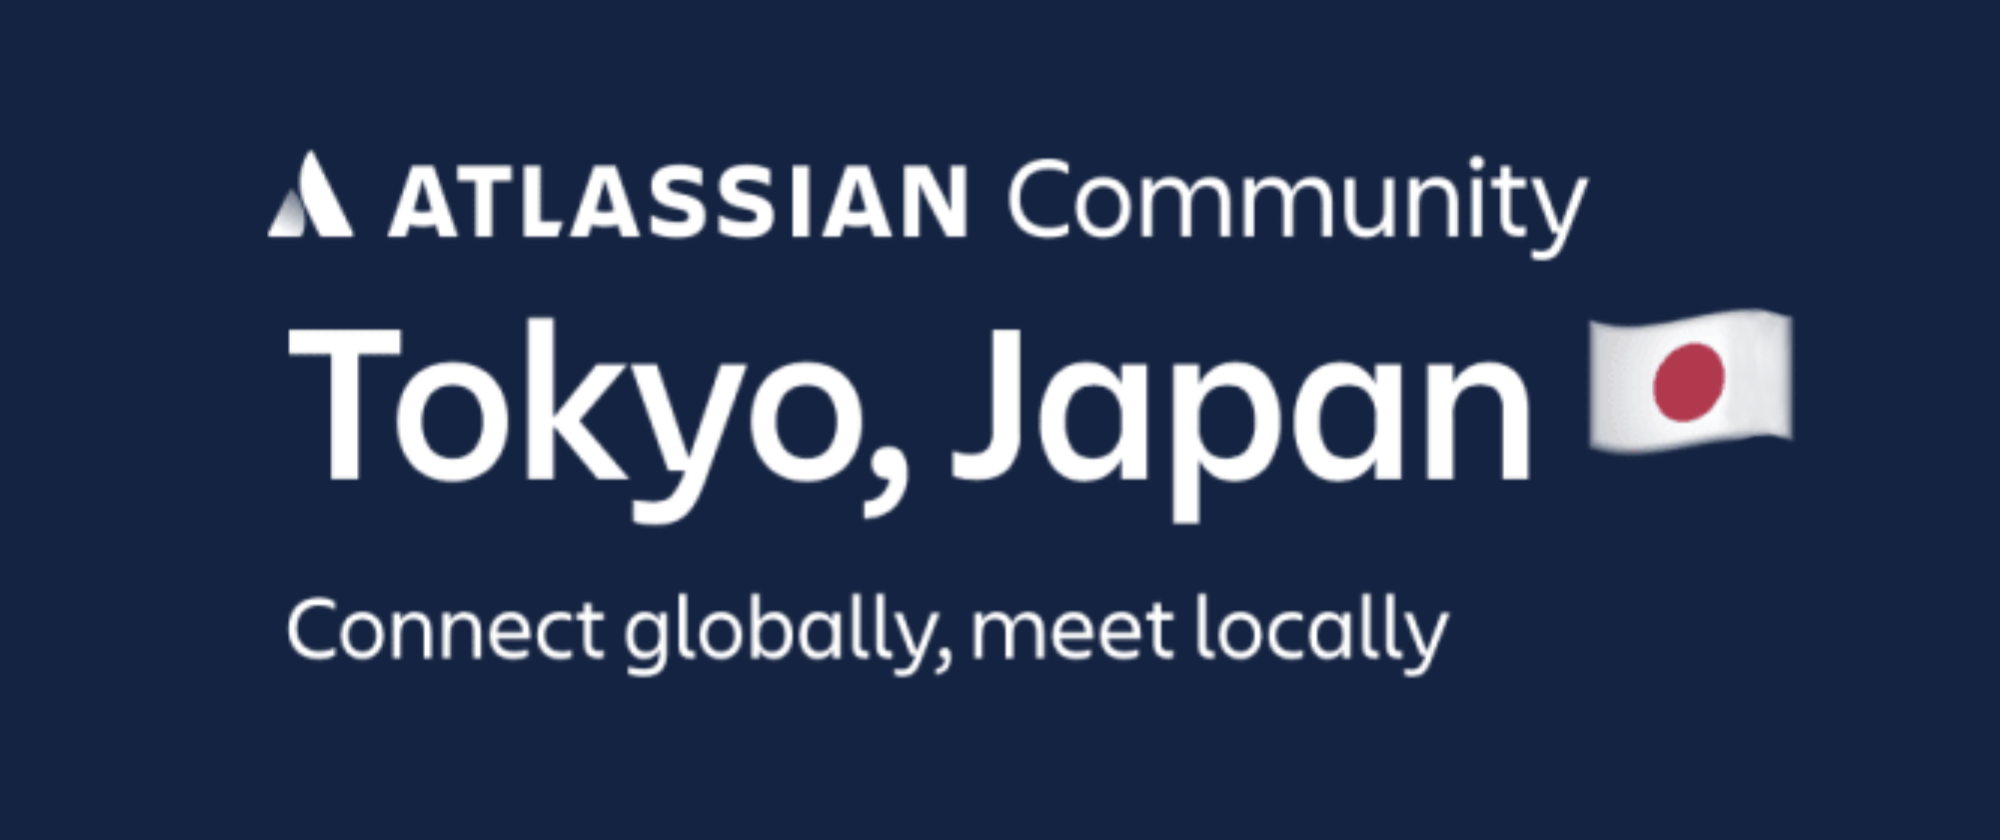 Atlassian Community Events Tokyo(ACE Tokyo)